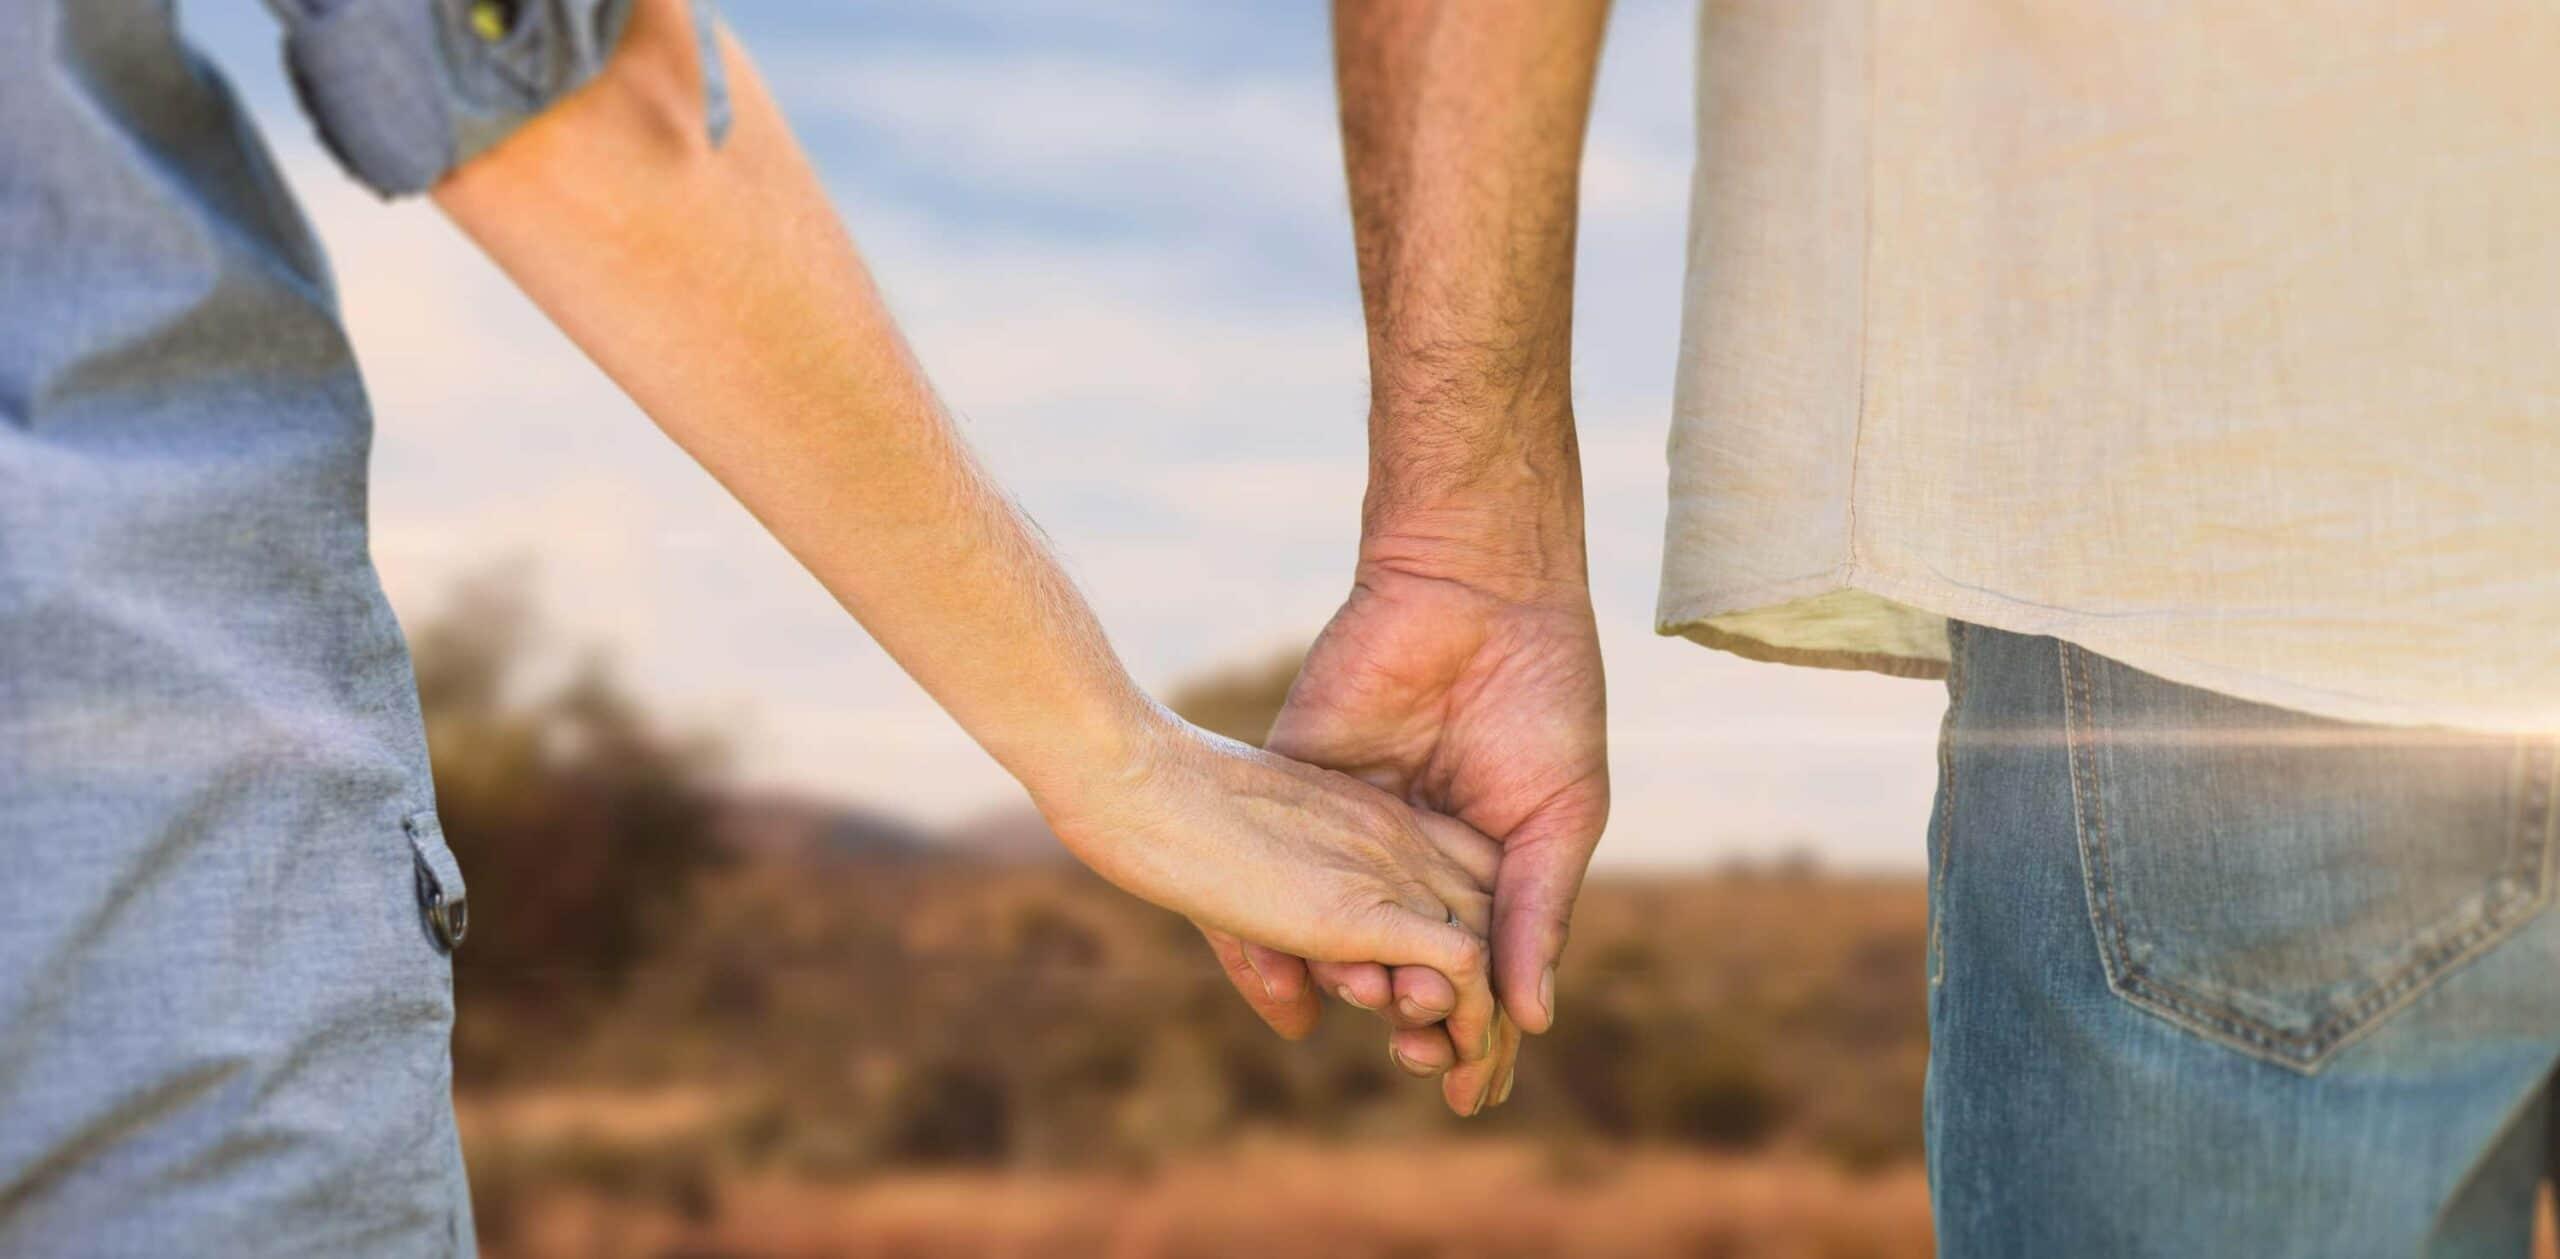 Myths About HIV